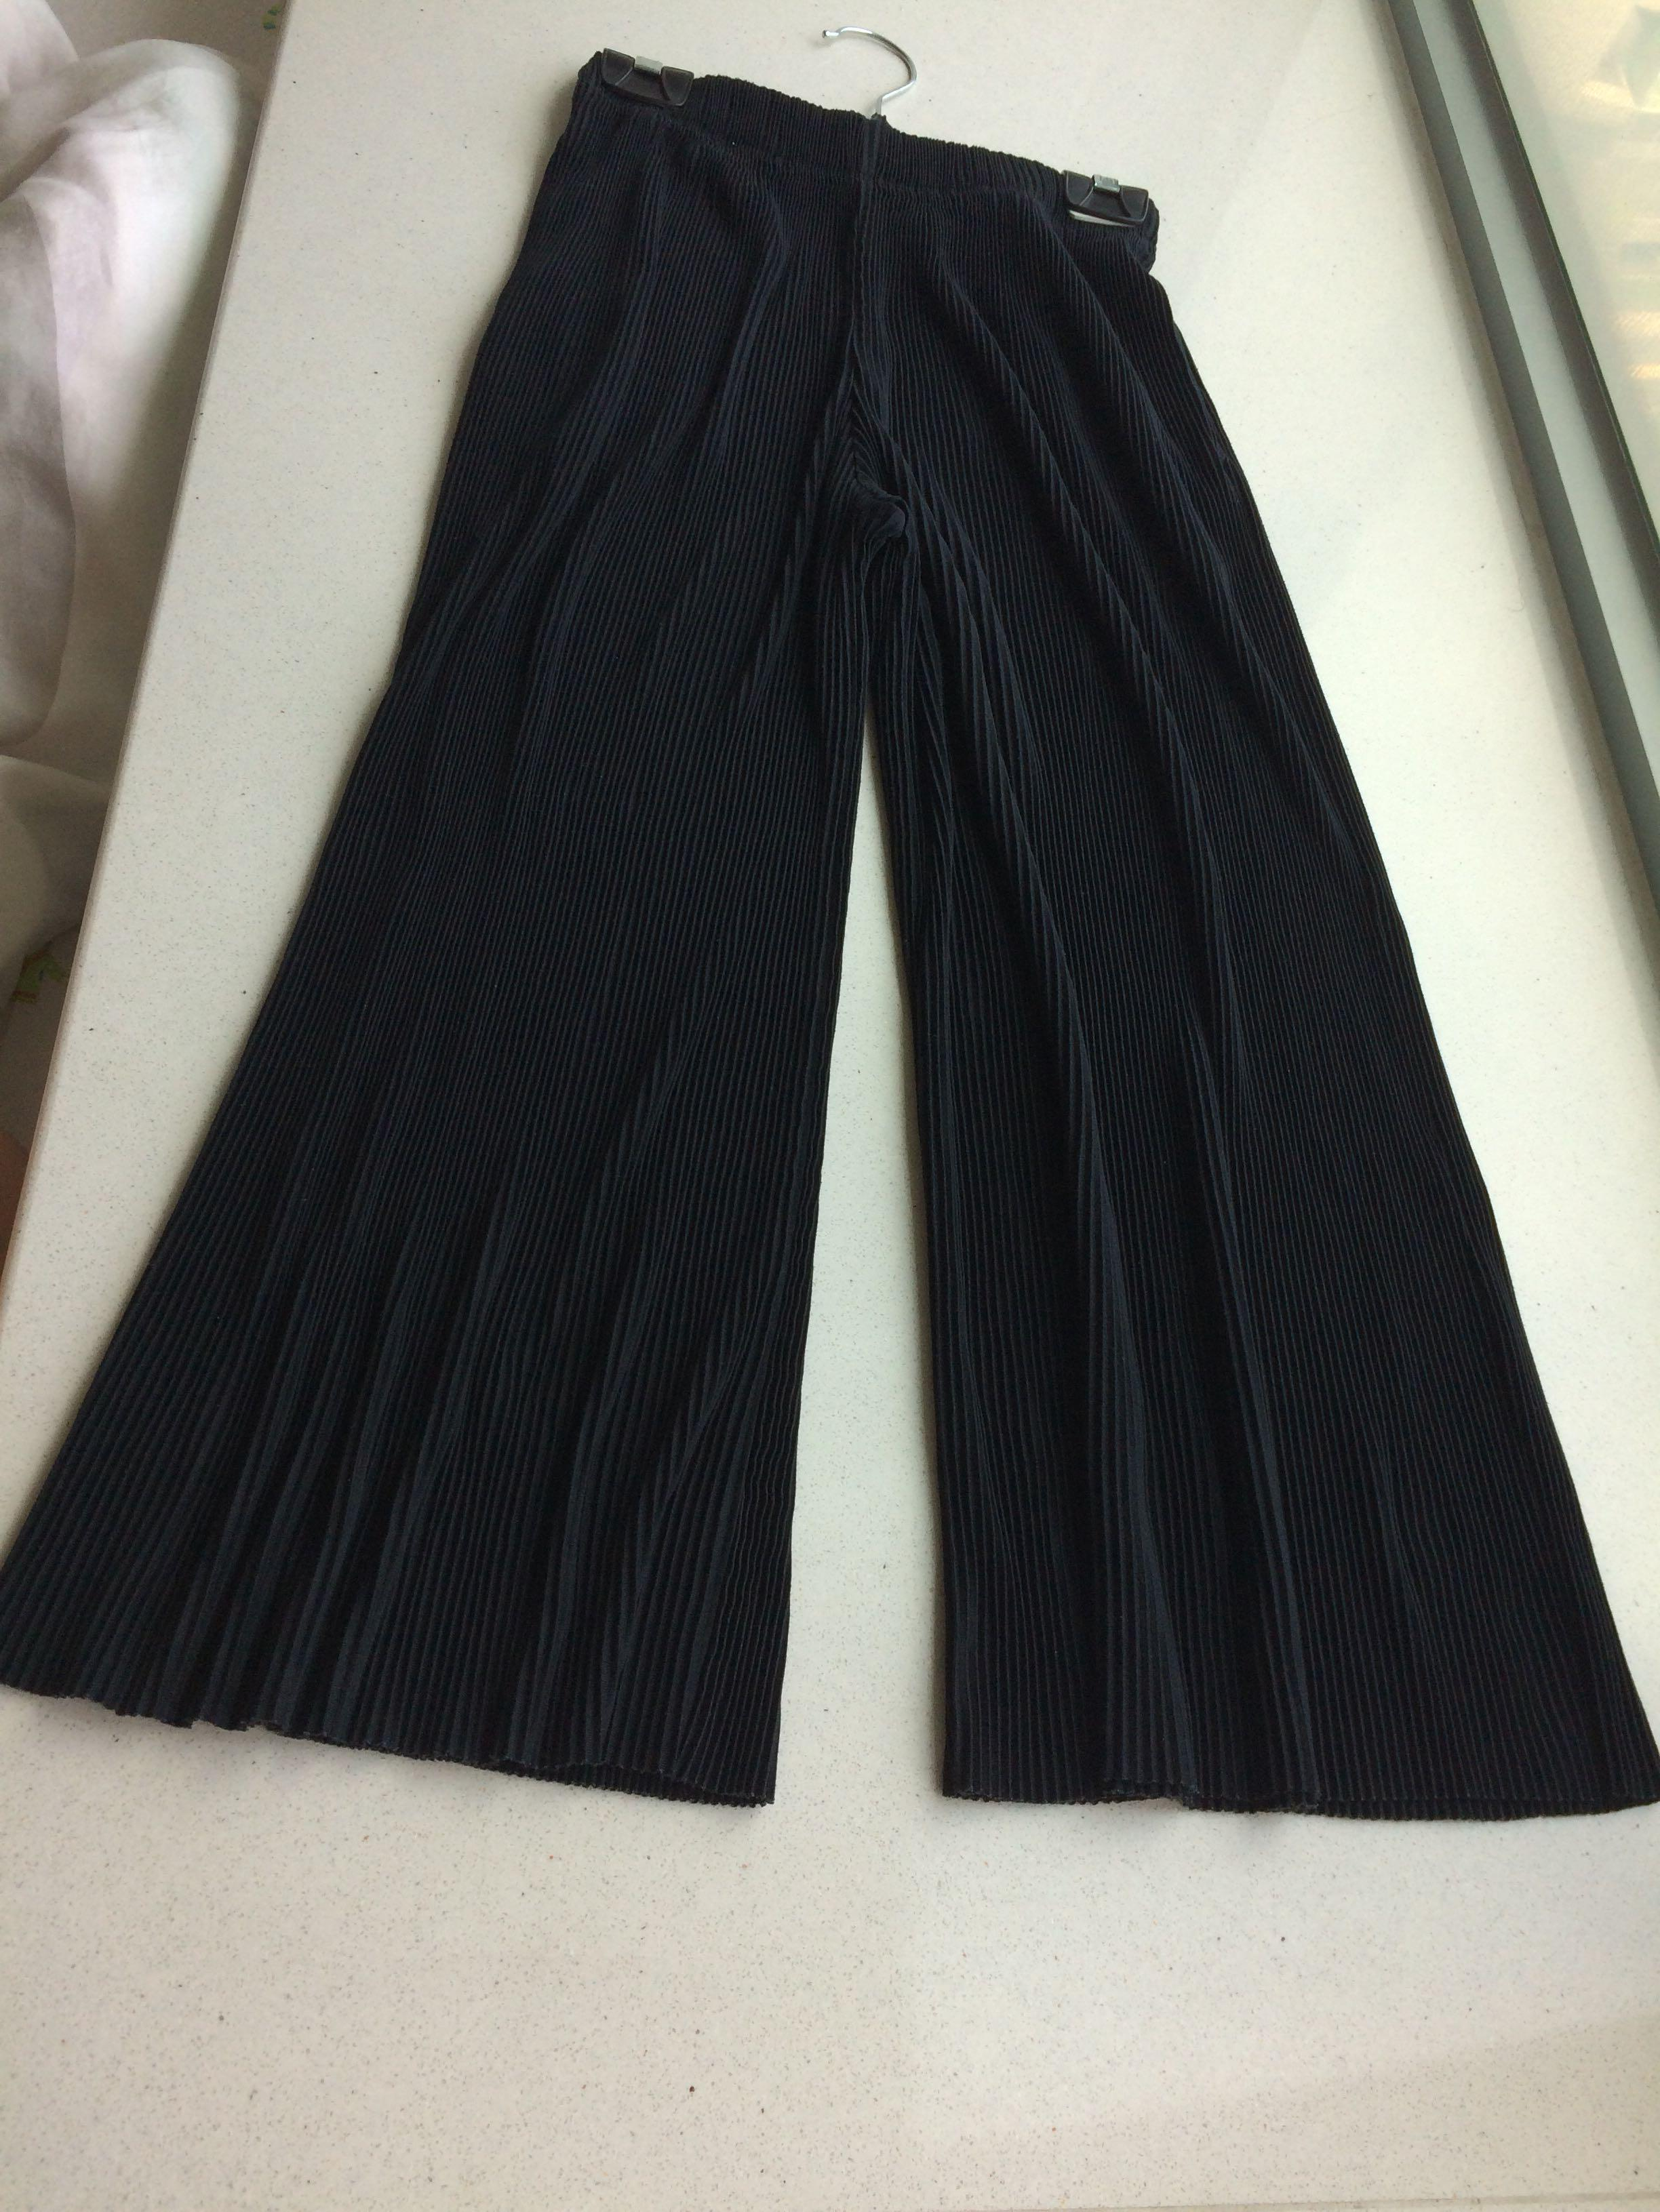 UNIQLO Culotte Pants